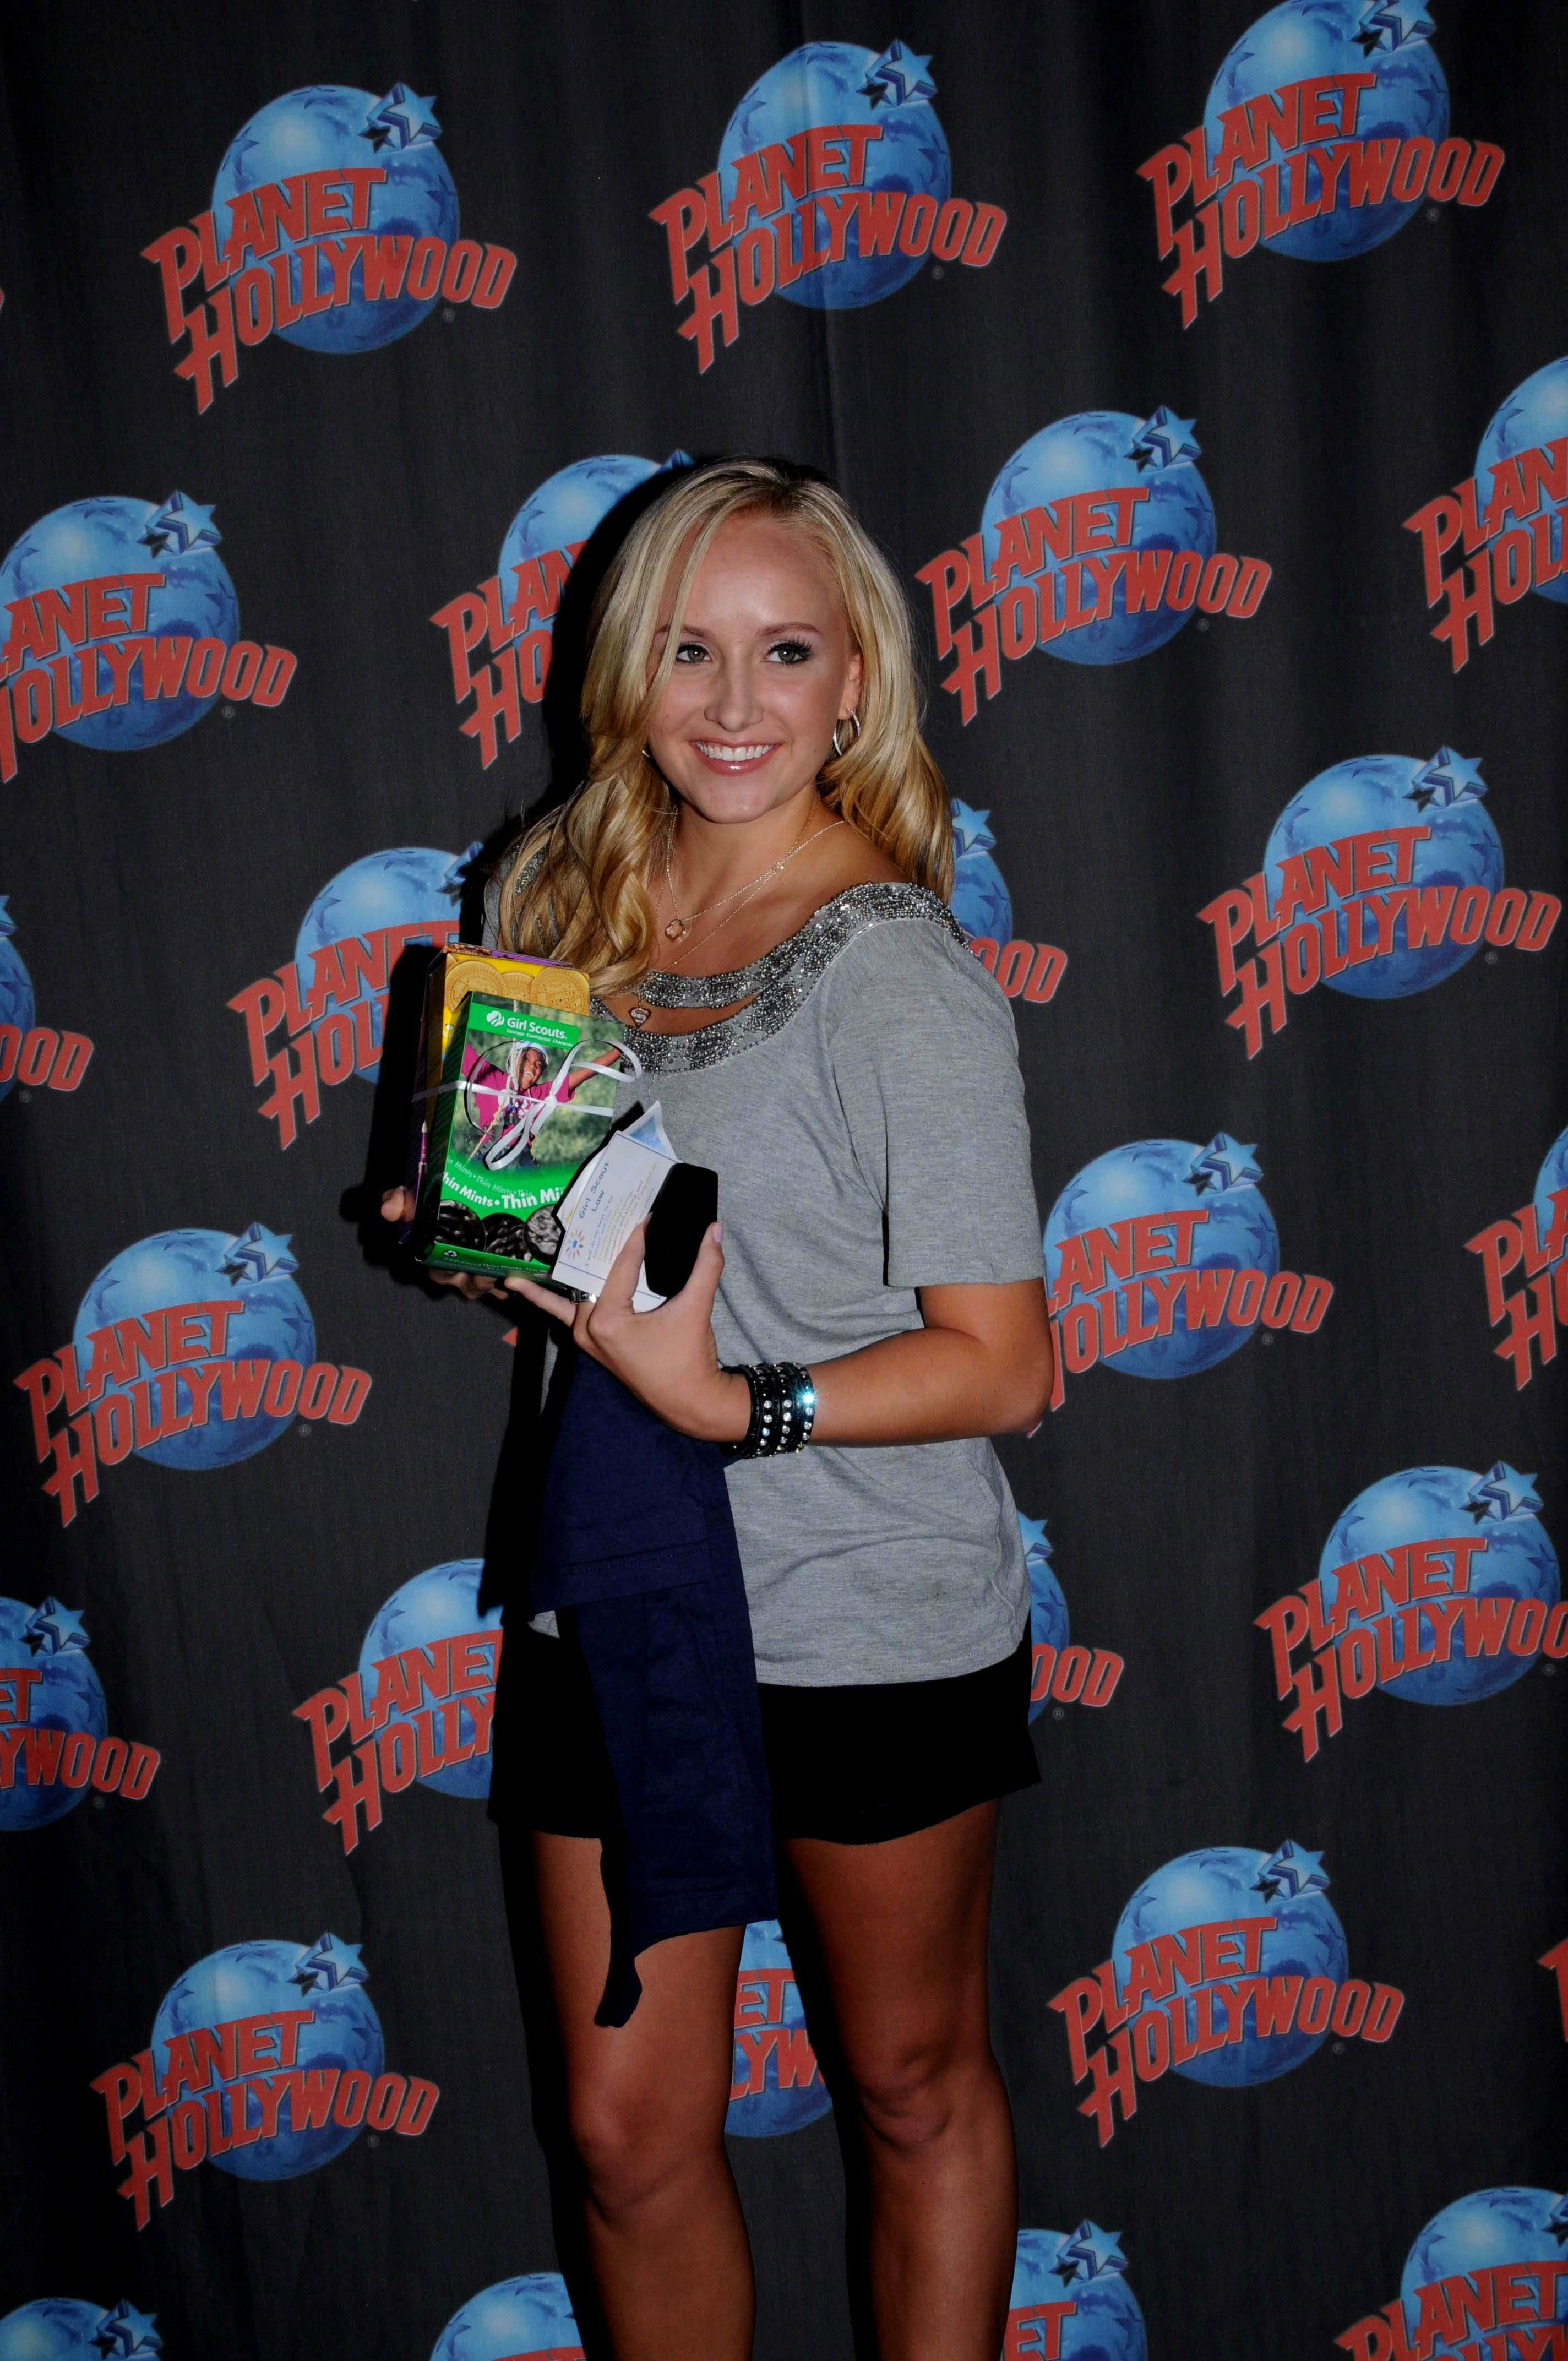 116987758_Nastia_liukin_promotes_Supergirl_clothing_line_at_Planet_Hollywood_1_122_539lo.jpg